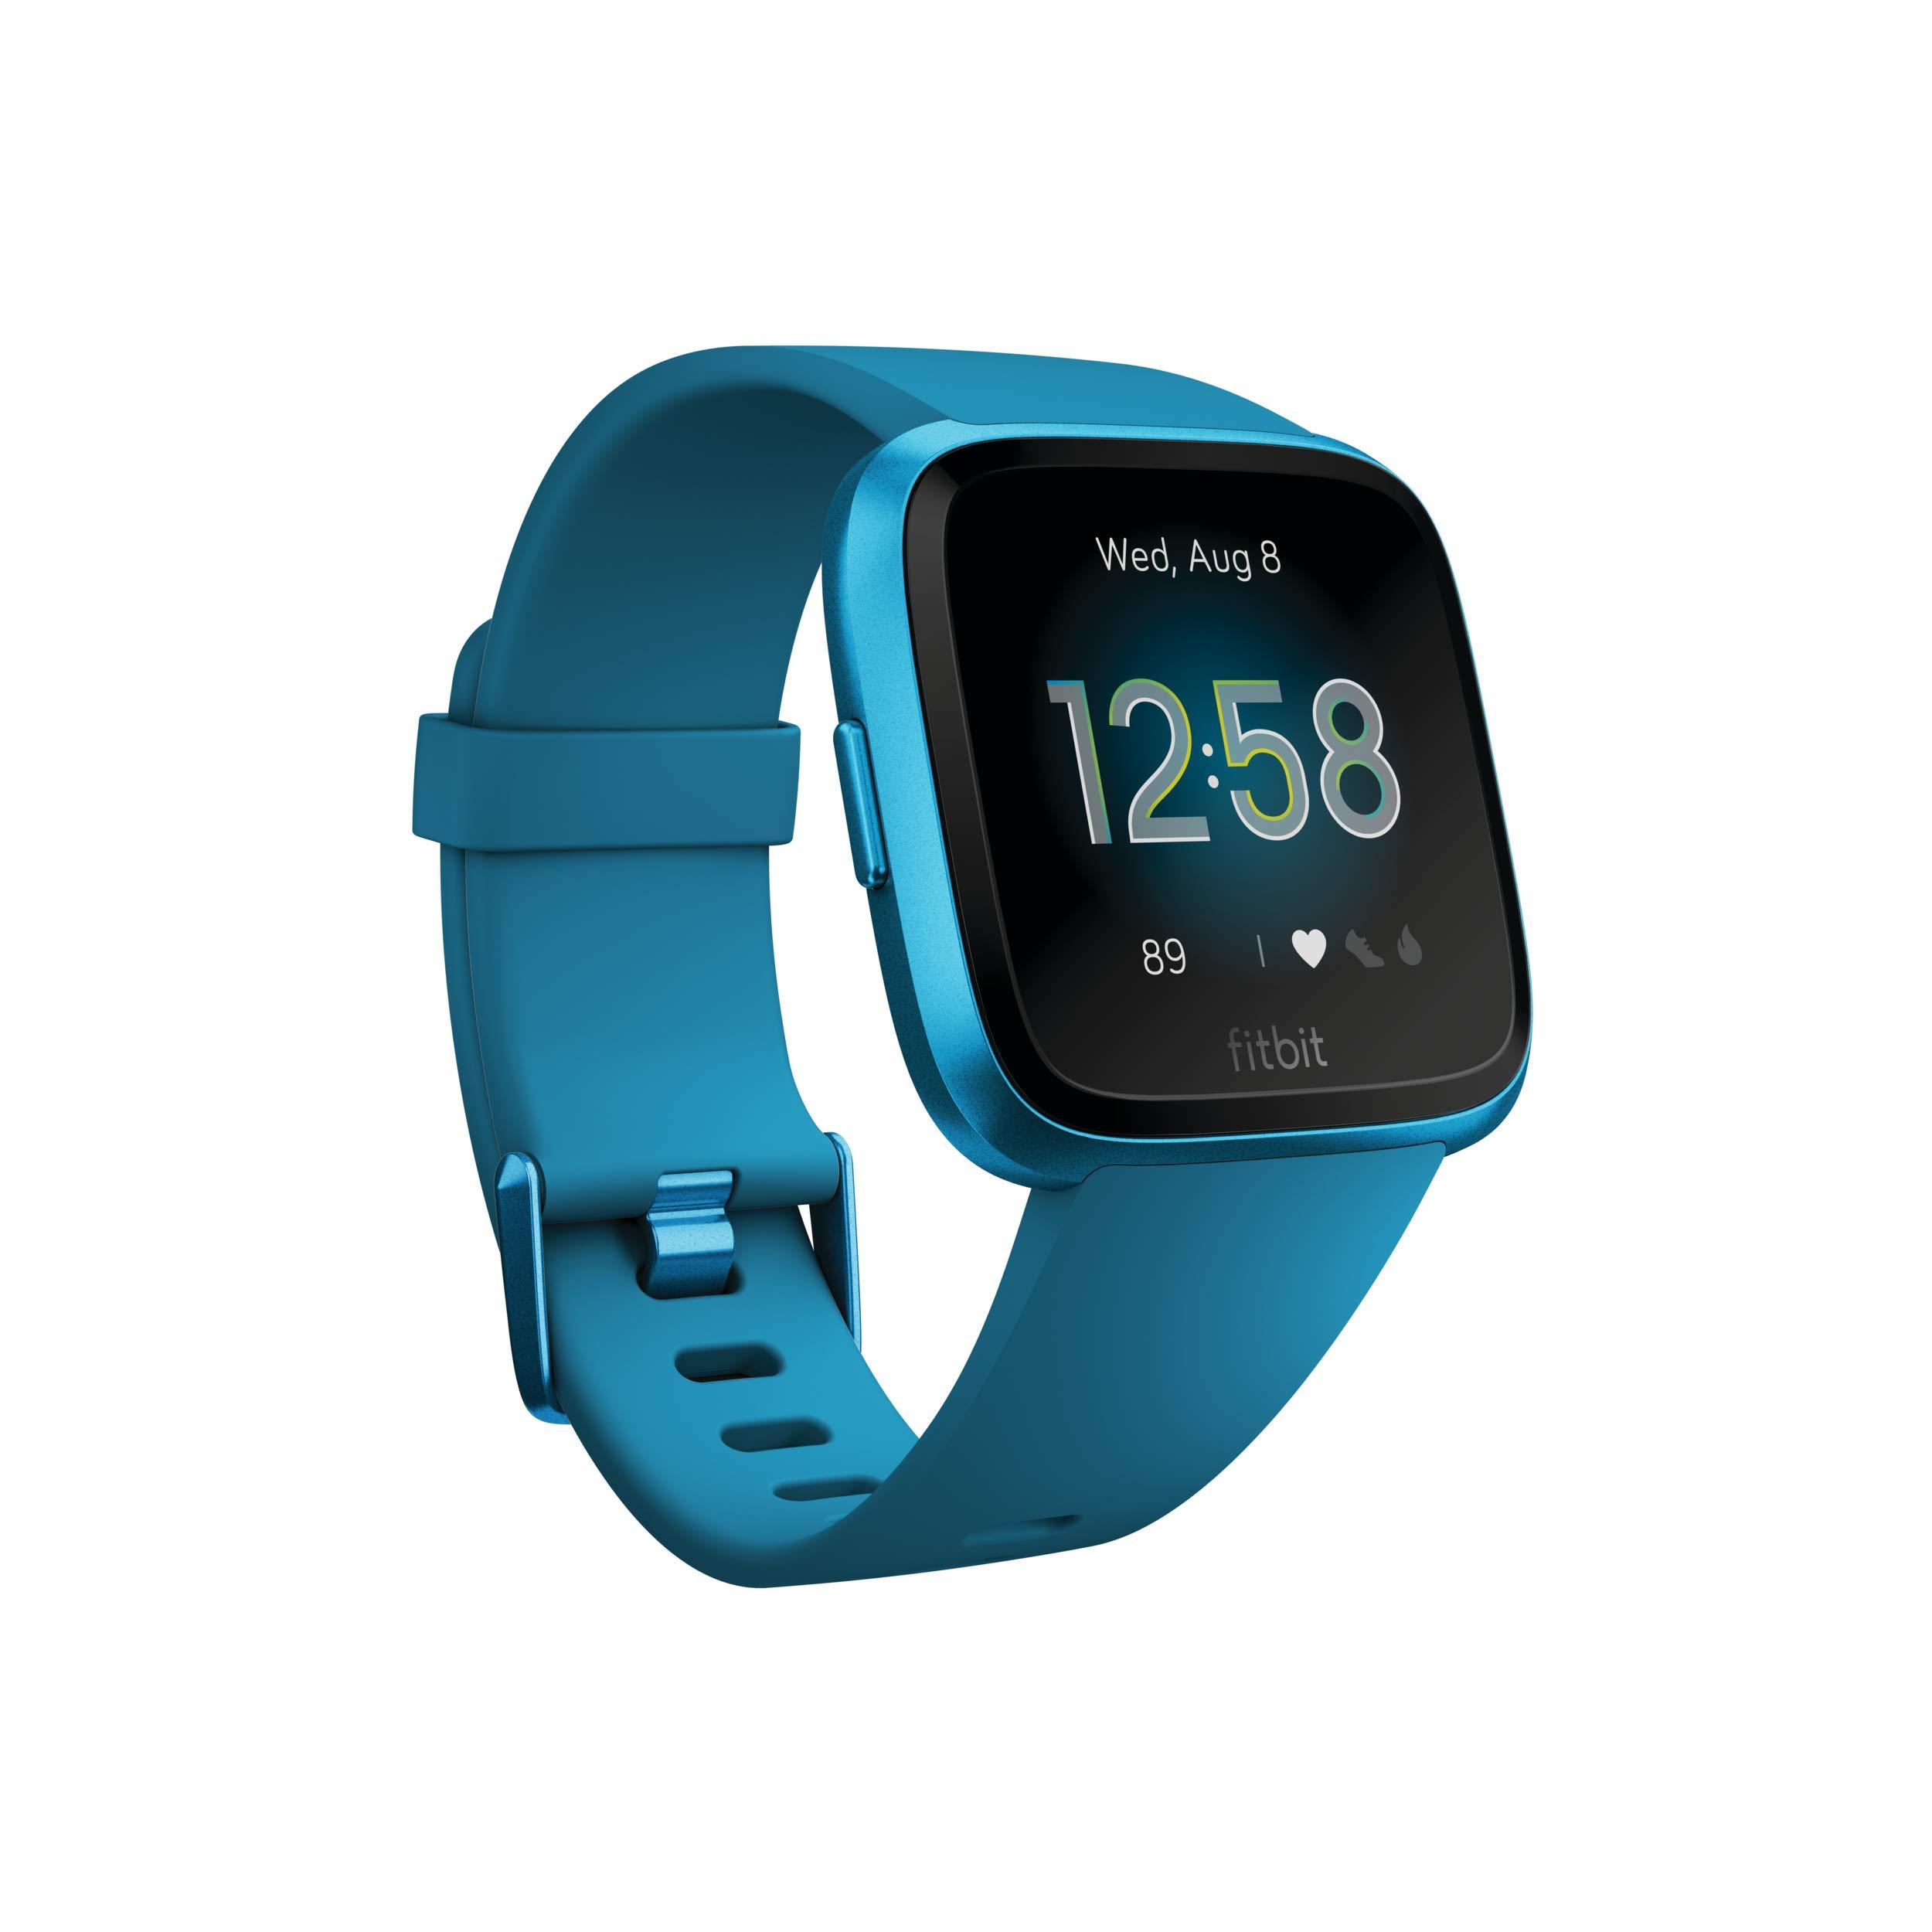 Fitbit Versa Smart Watch included